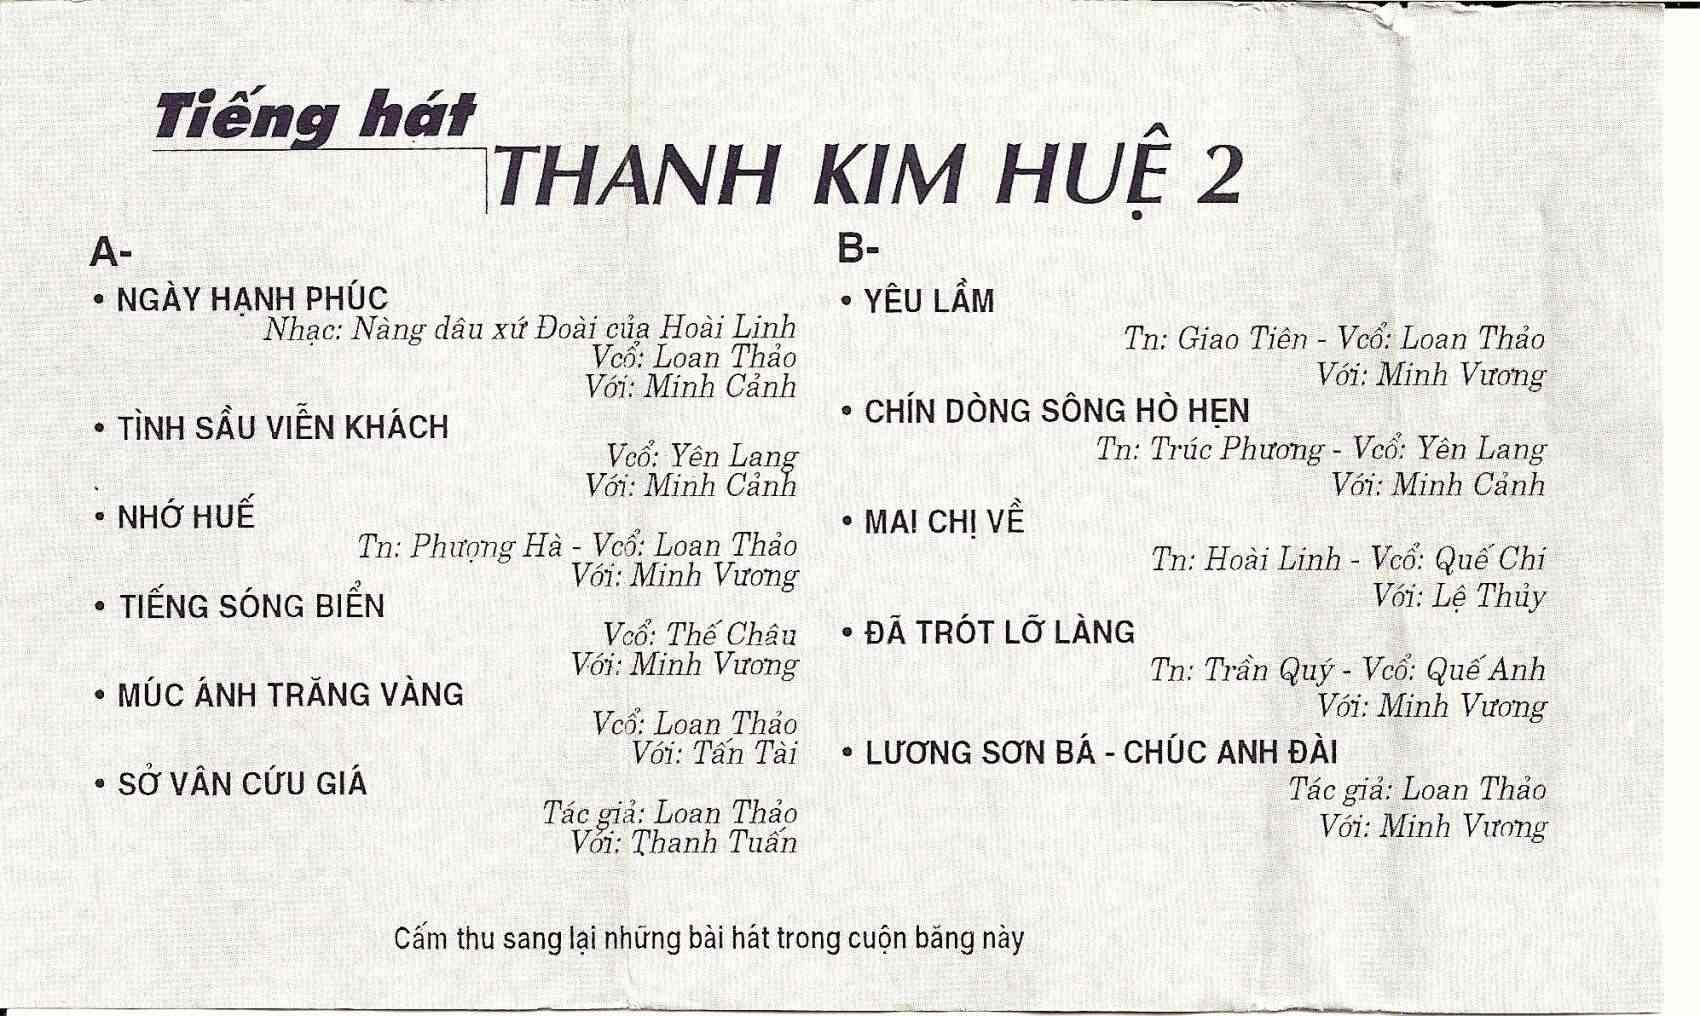 Thanh Kim Huệ 2 Thanhk11